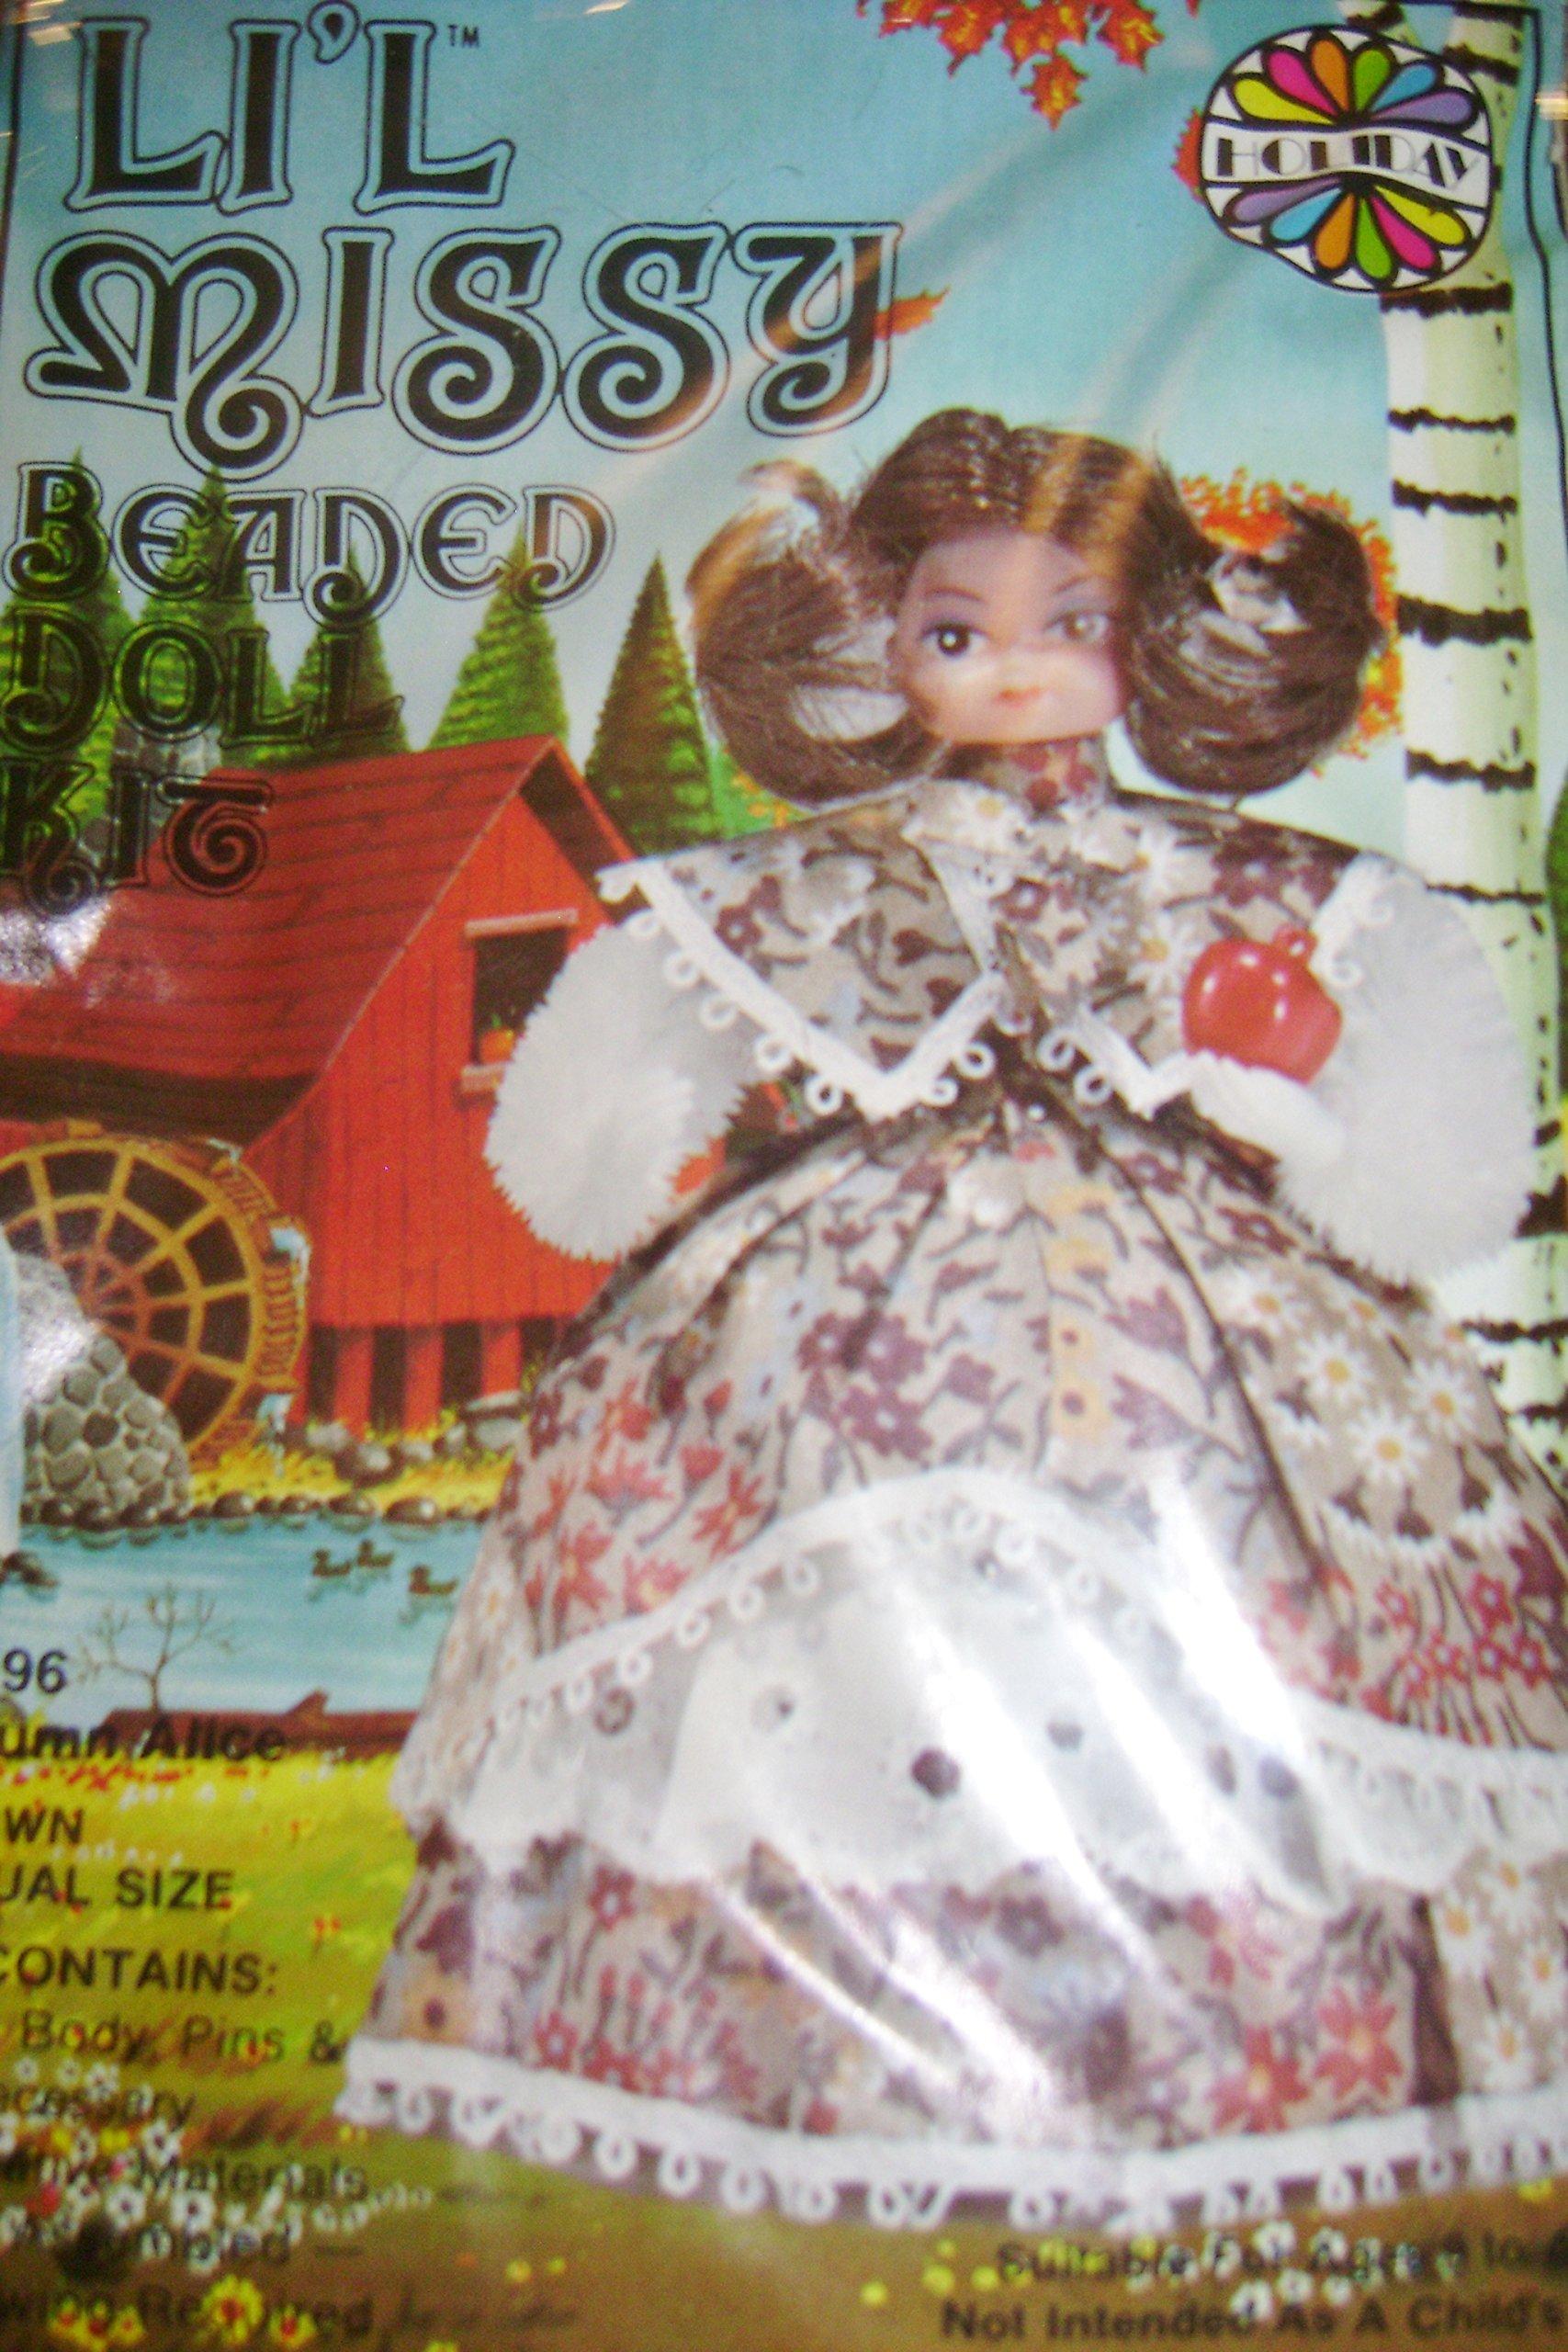 Vintage Walco Li'l Missy Autumn Alice Beaded Doll Kit #13396 by Lil Missy (Image #1)